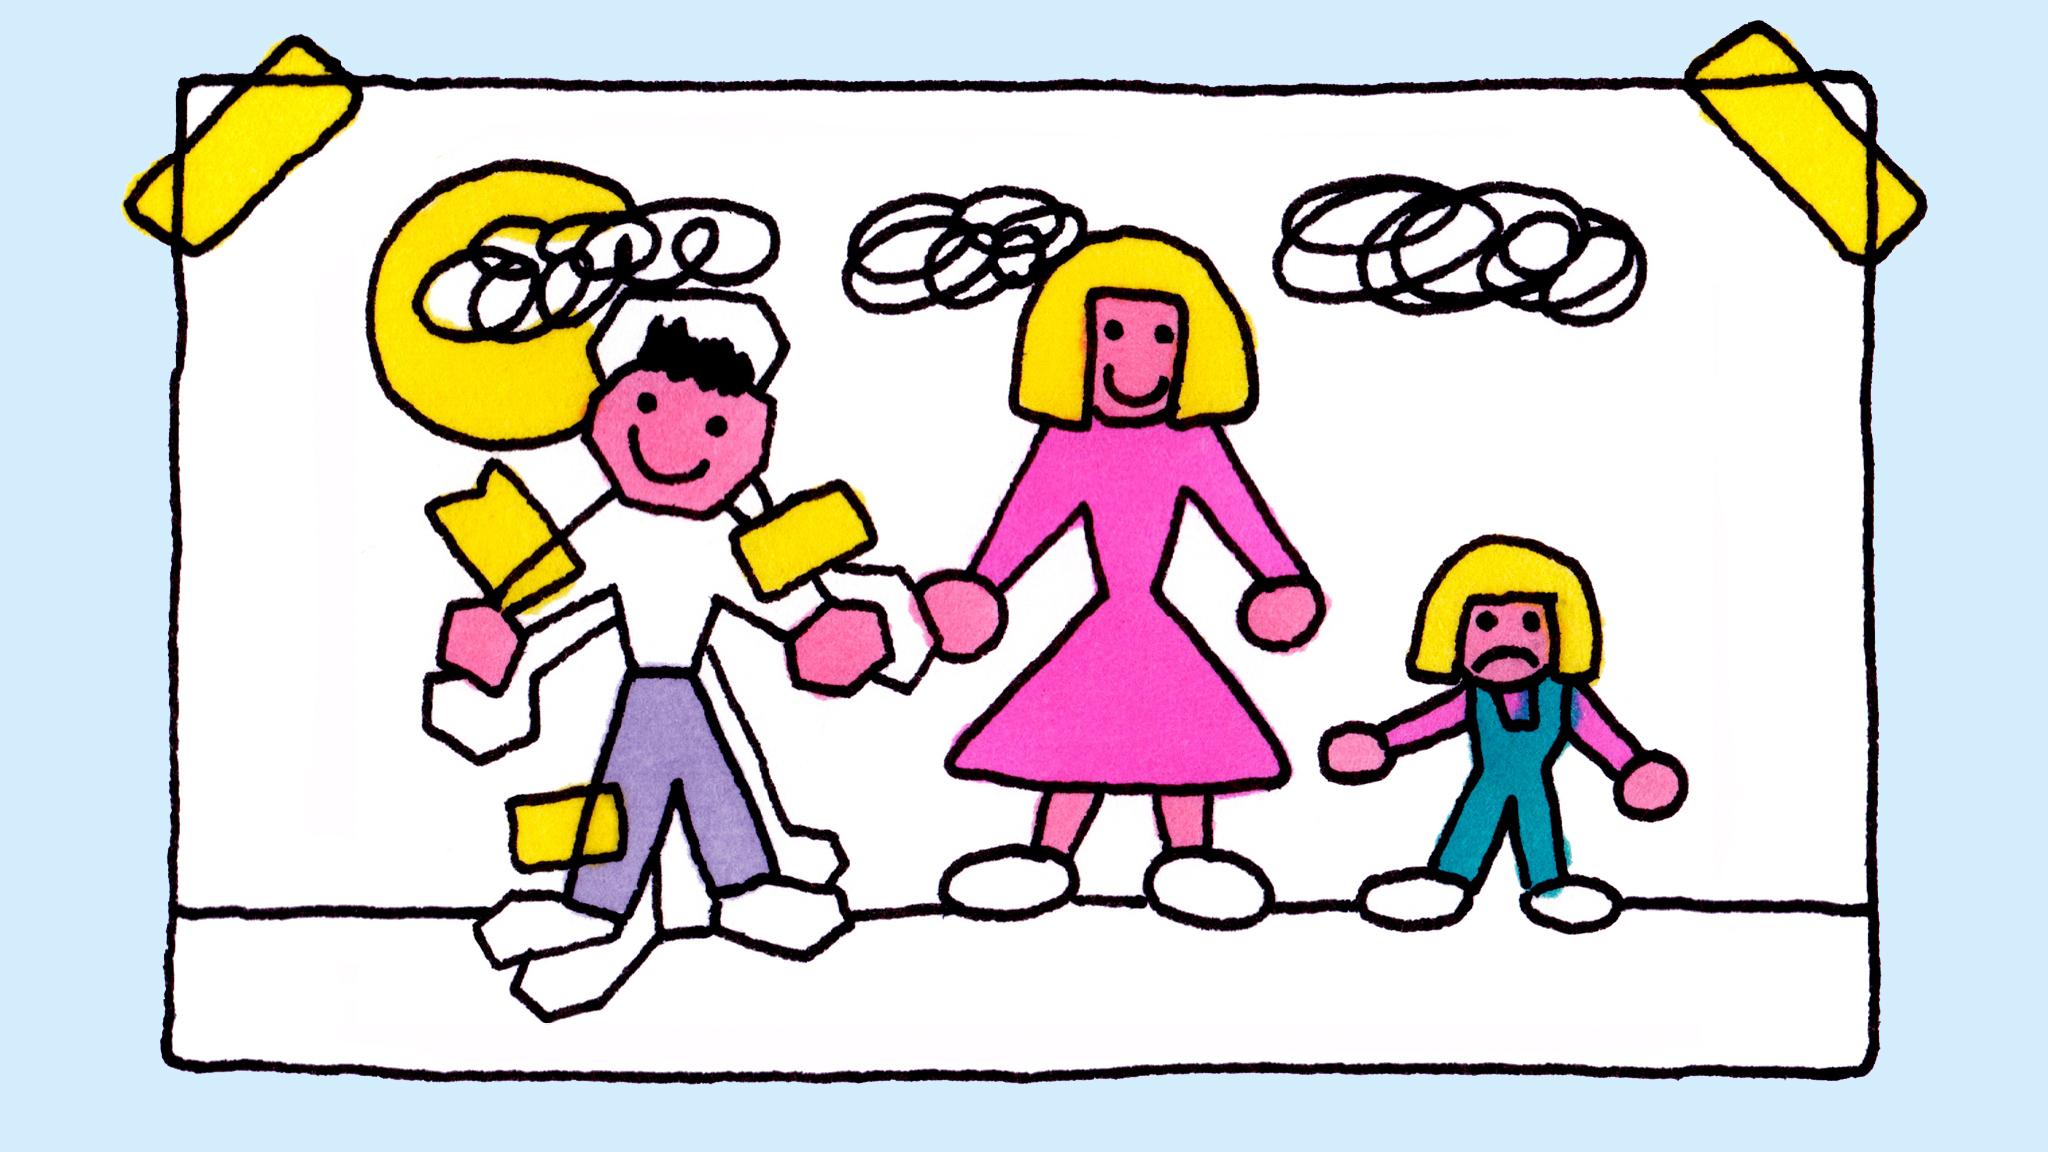 Meet the step-parents | Financial Times